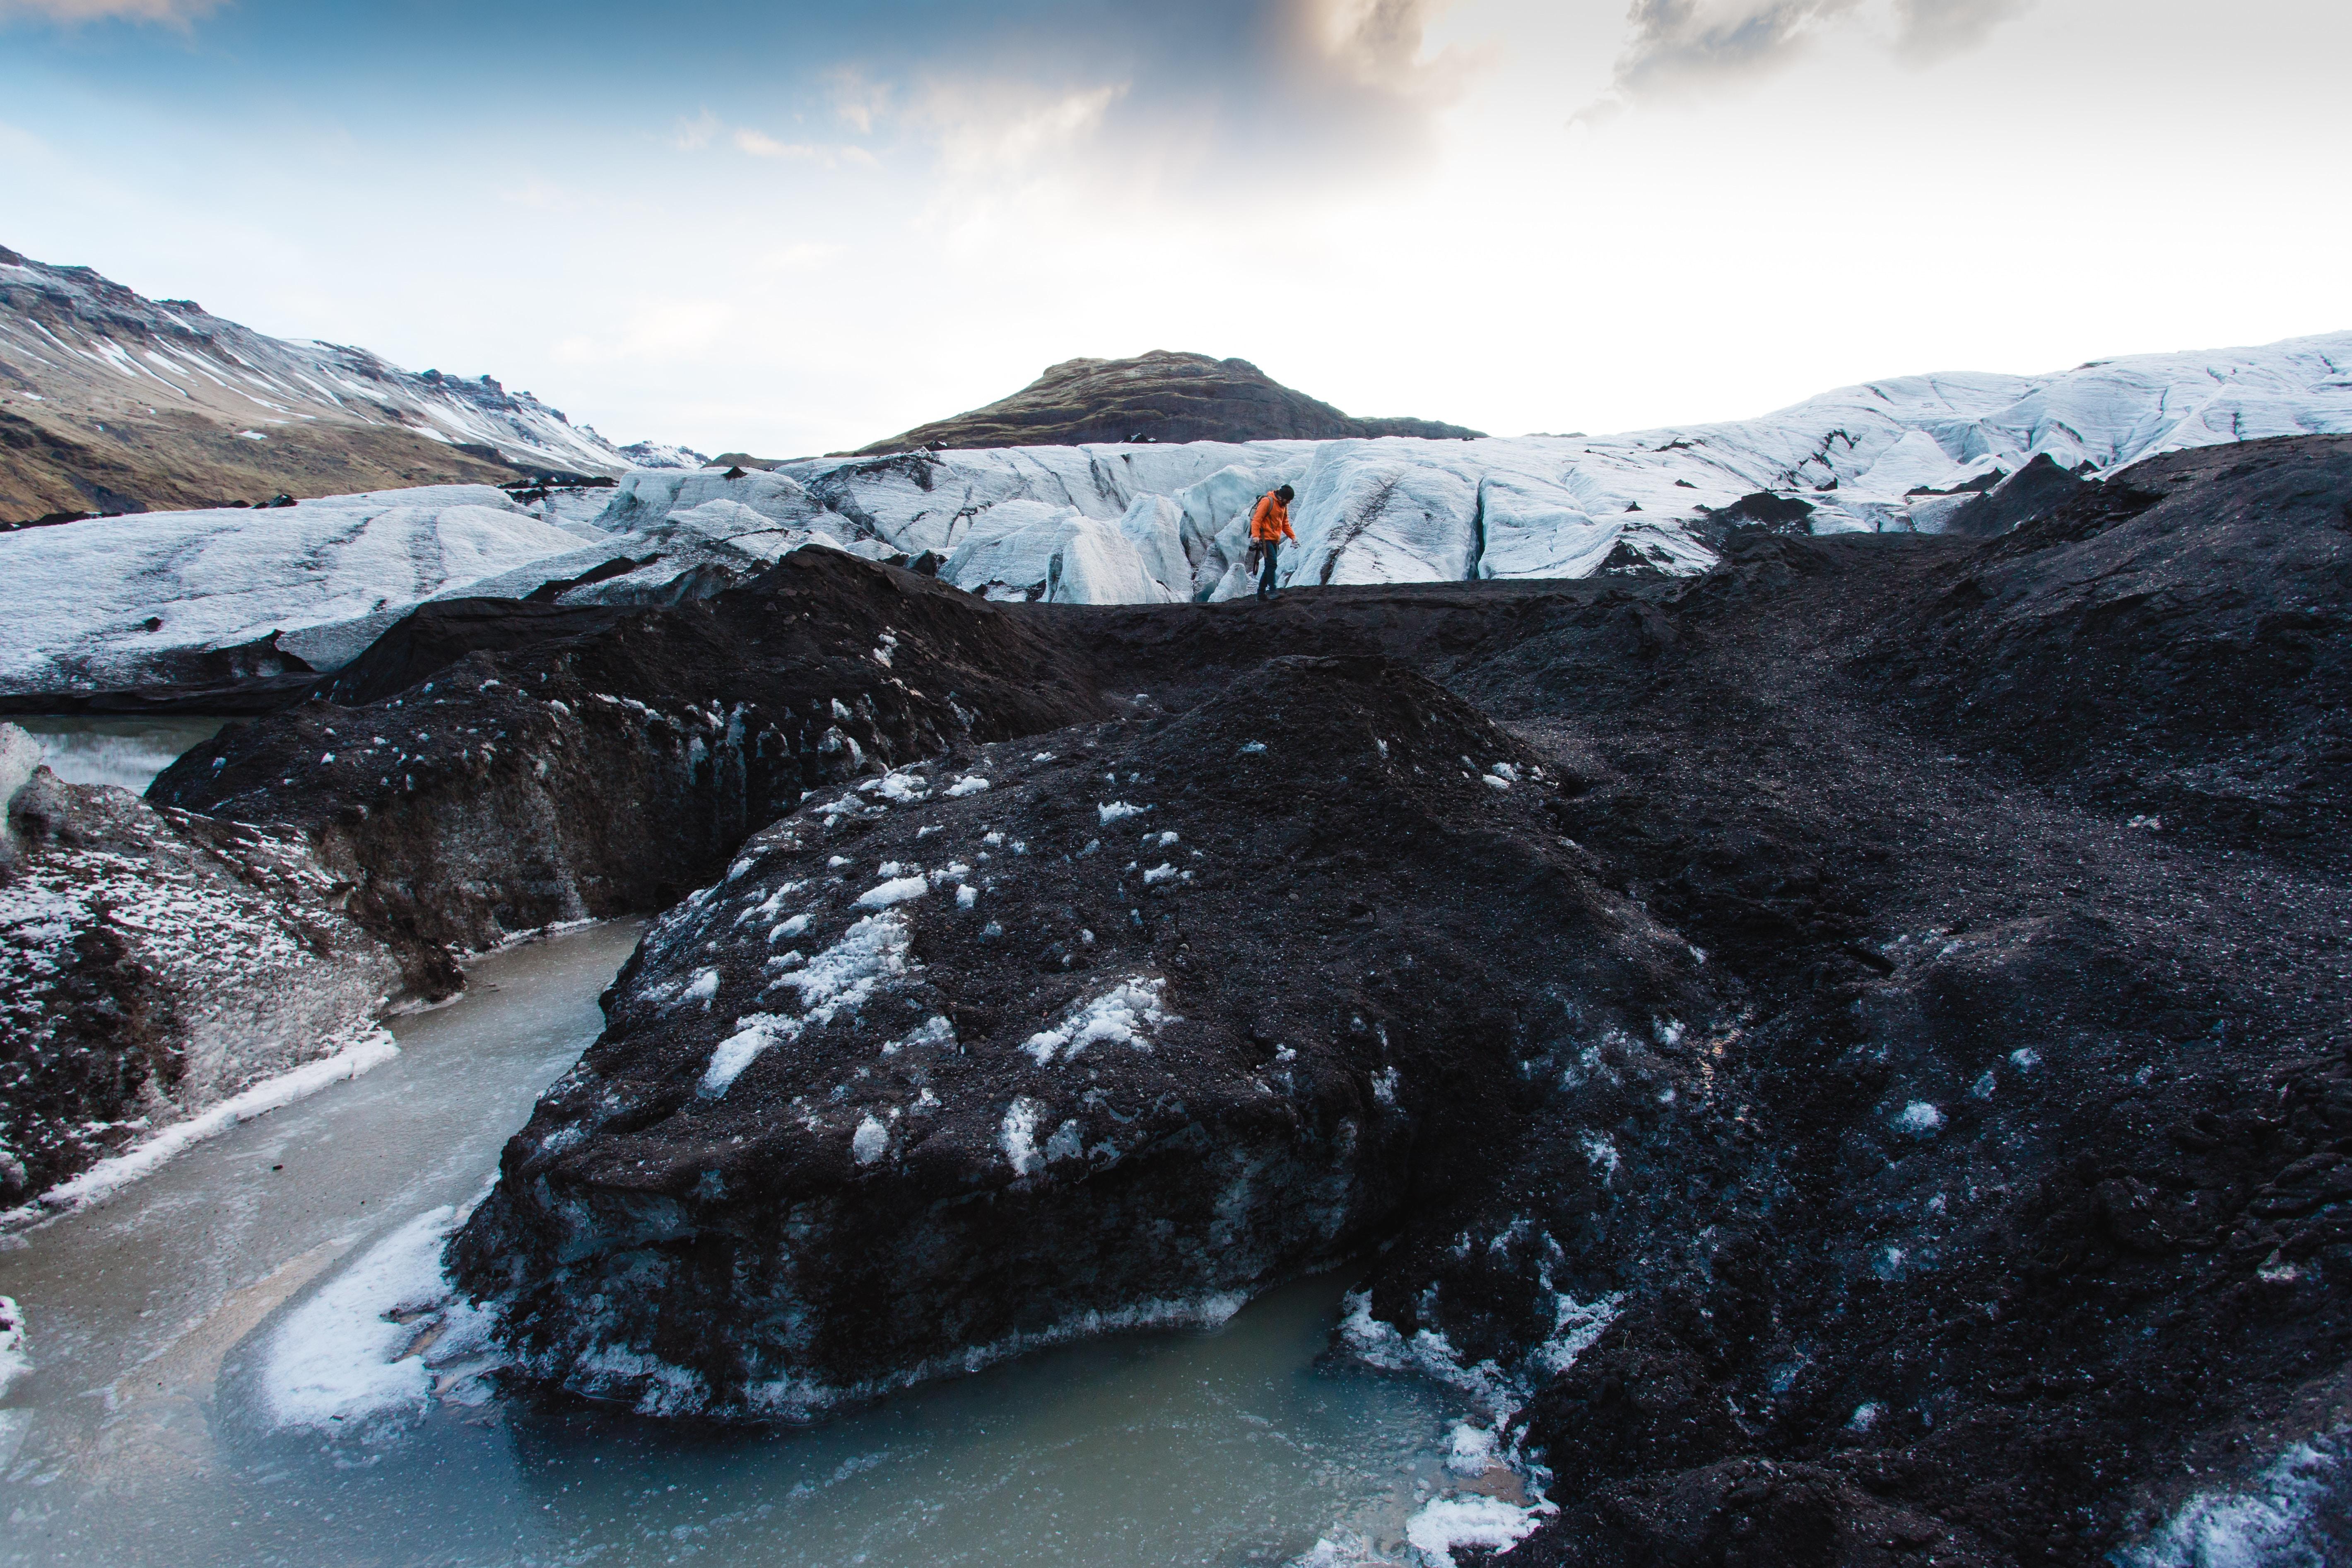 Hiker walks alone on a cold ridge near the river